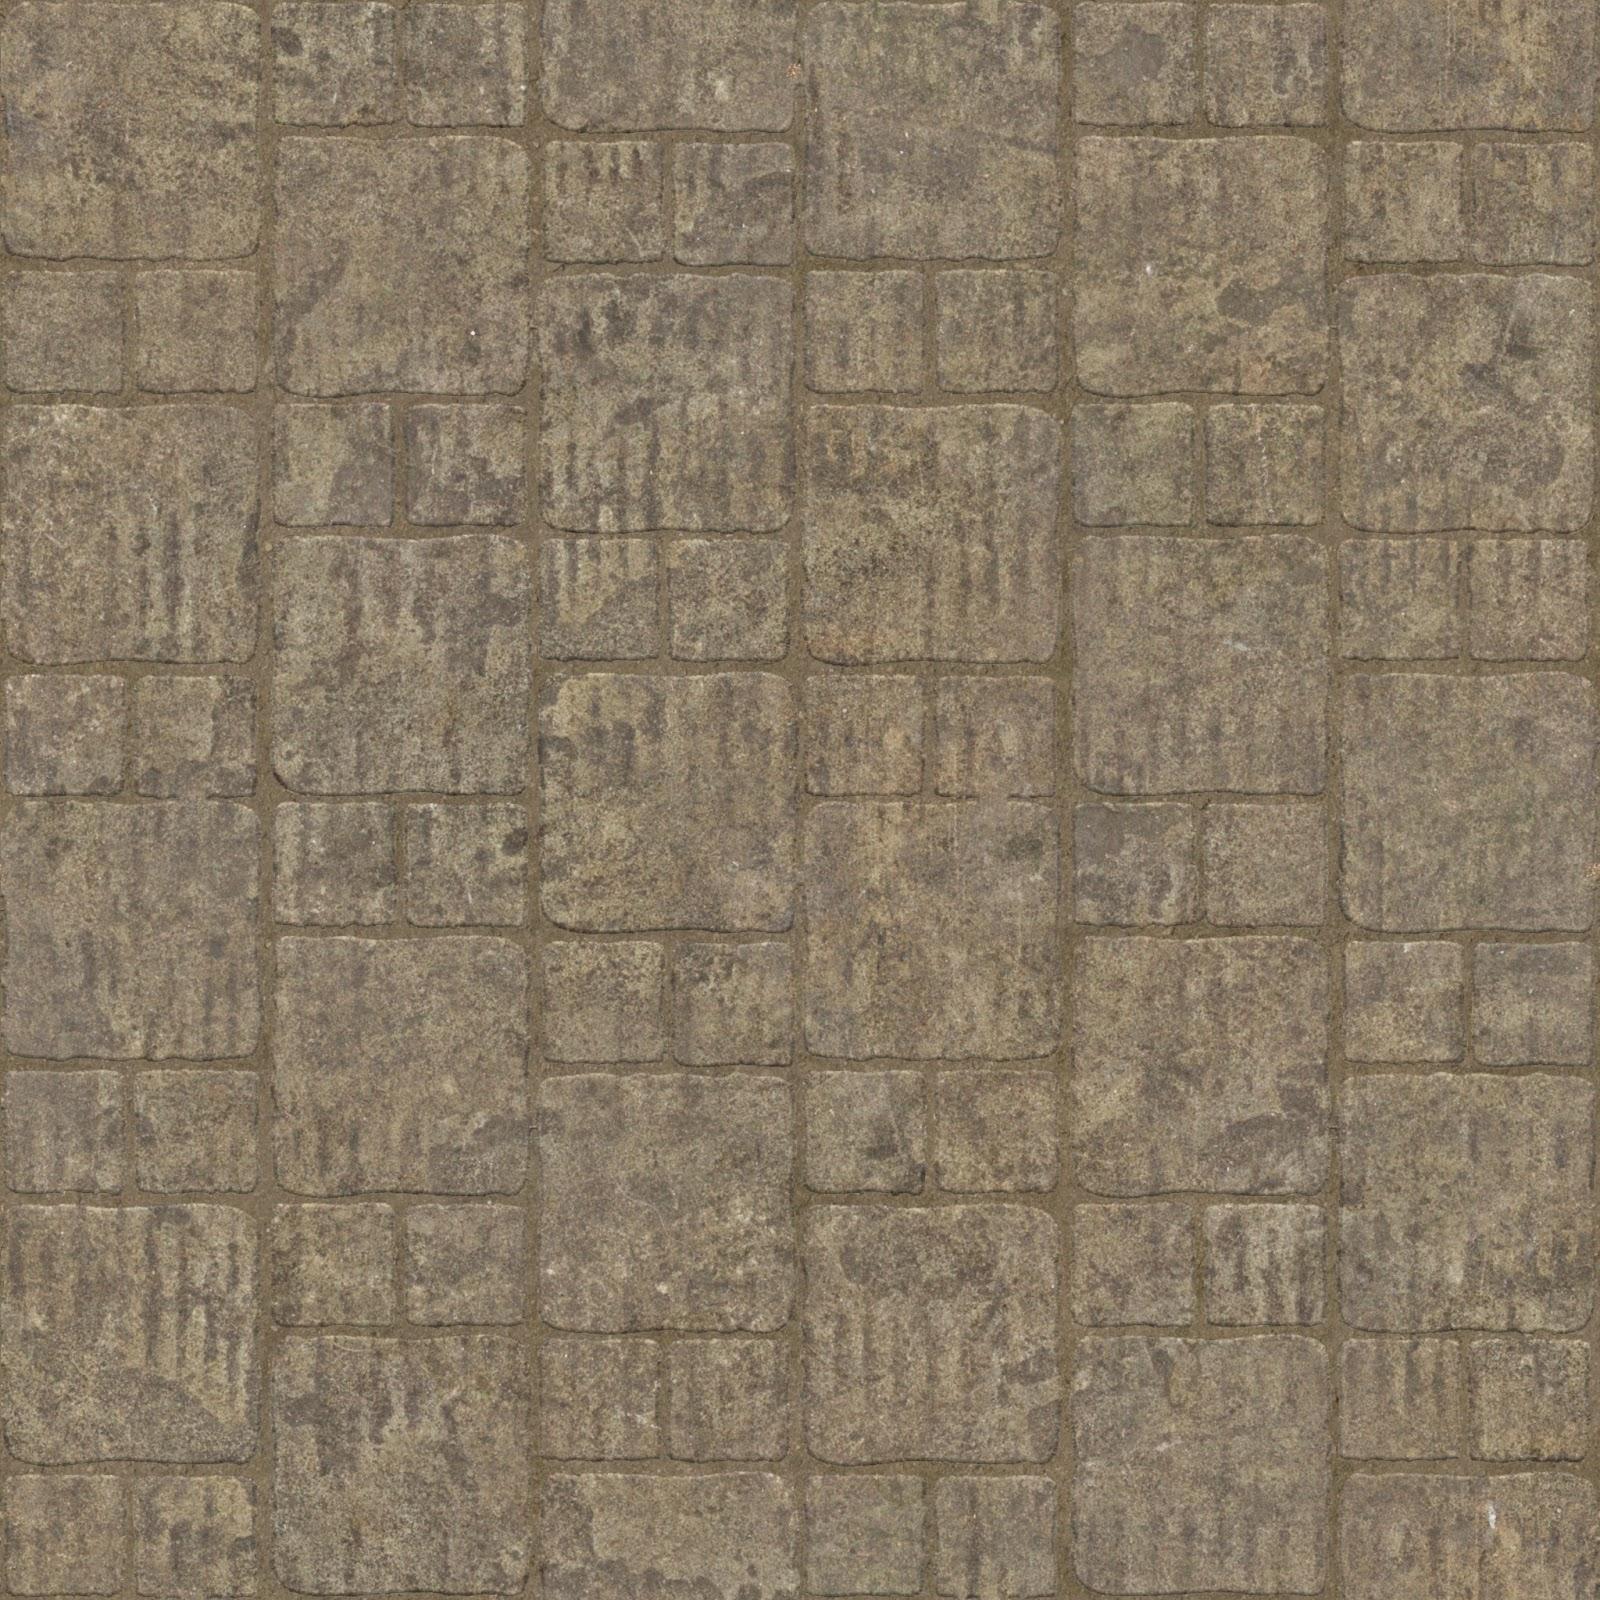 high resolution seamless textures brick stone floor tiles seamless texture 2048x2048. Black Bedroom Furniture Sets. Home Design Ideas